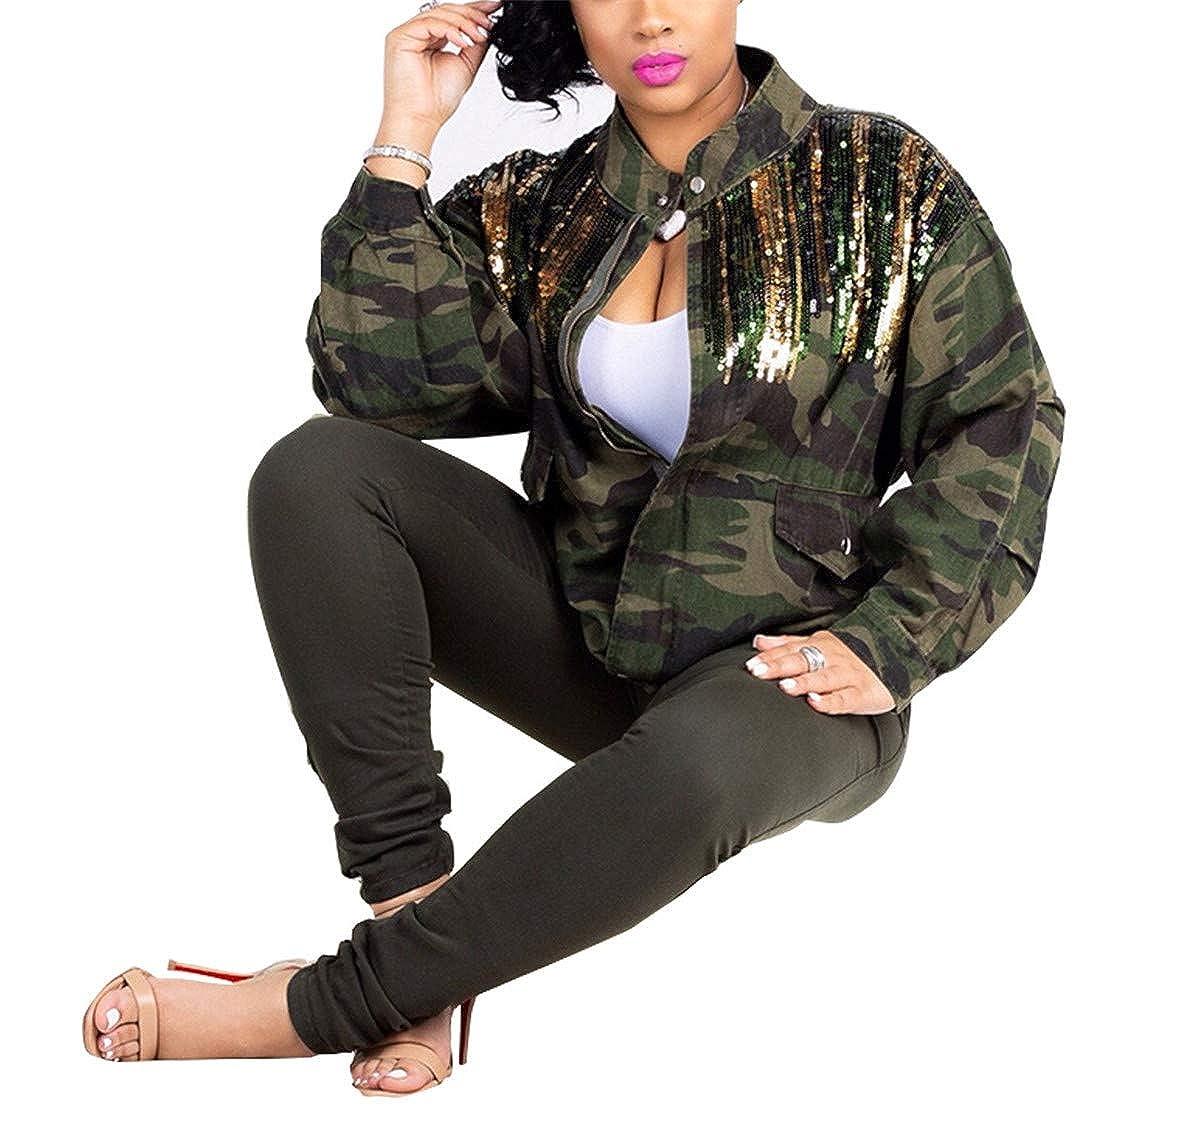 Antique Style Womens Street Fashion Military Camouflage Printed Short Coat Safari Jacket Overcoats